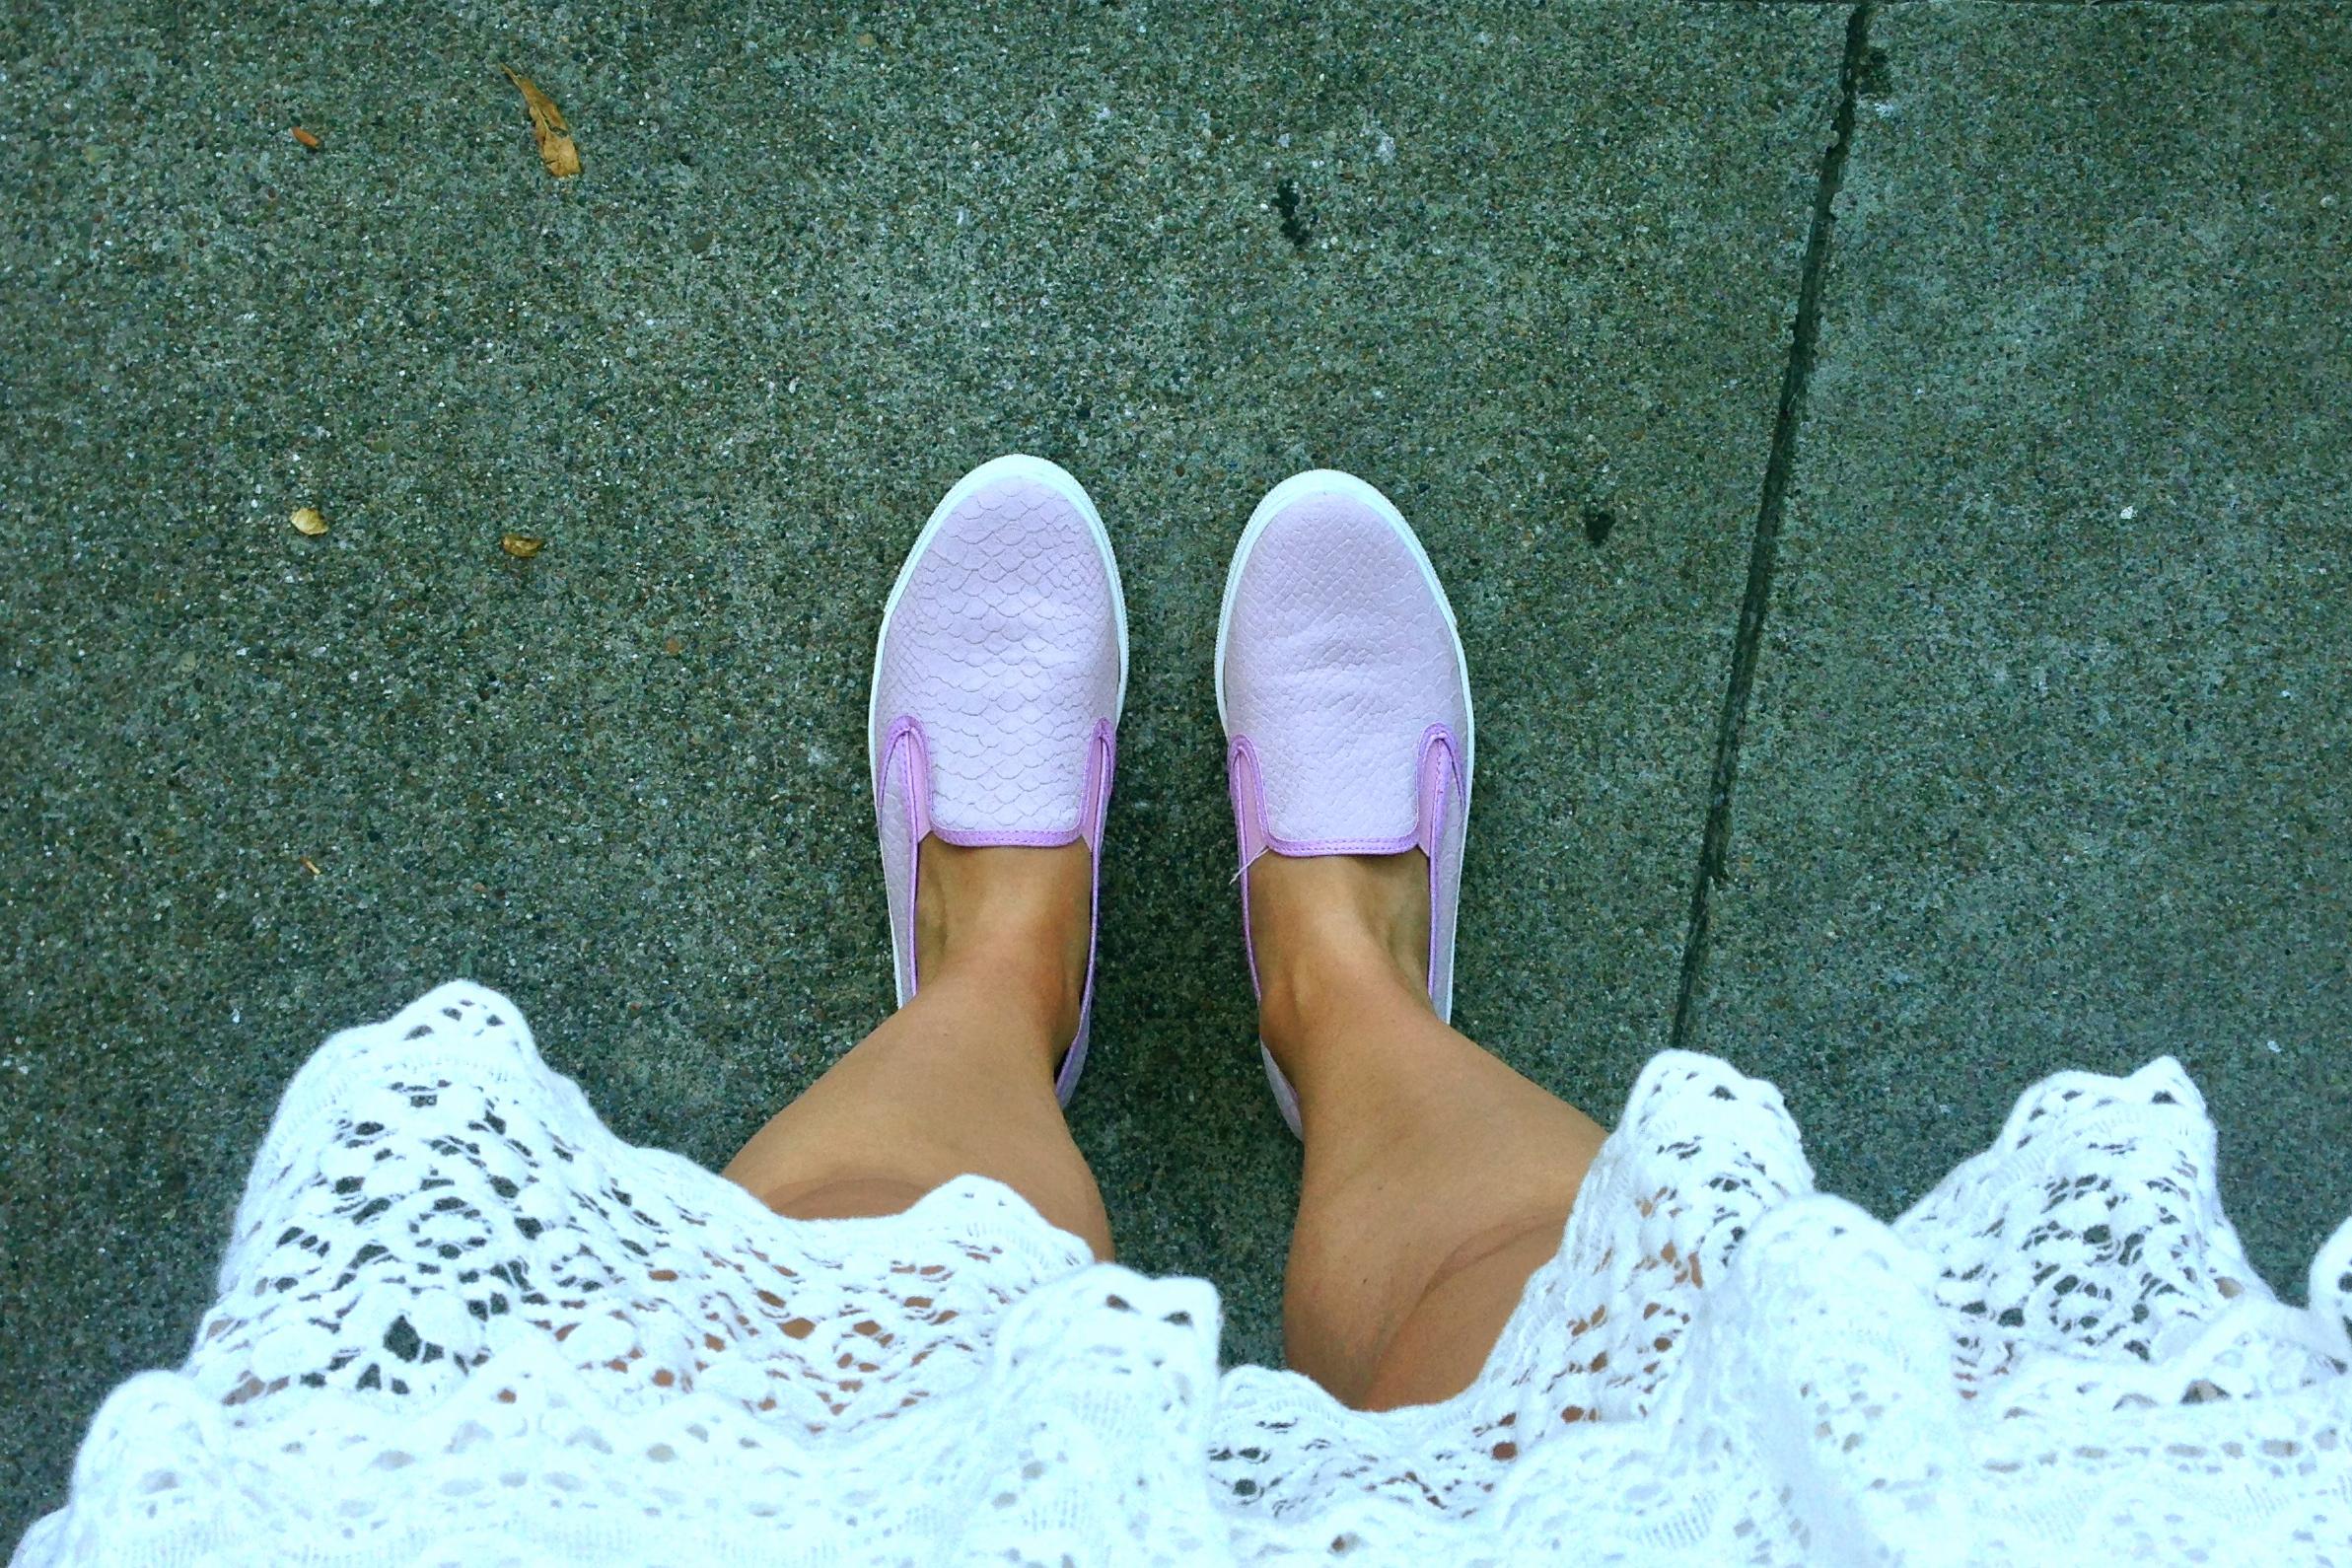 Crochet Skirt and Pink Topshop Slip-Ons- glamourita.com